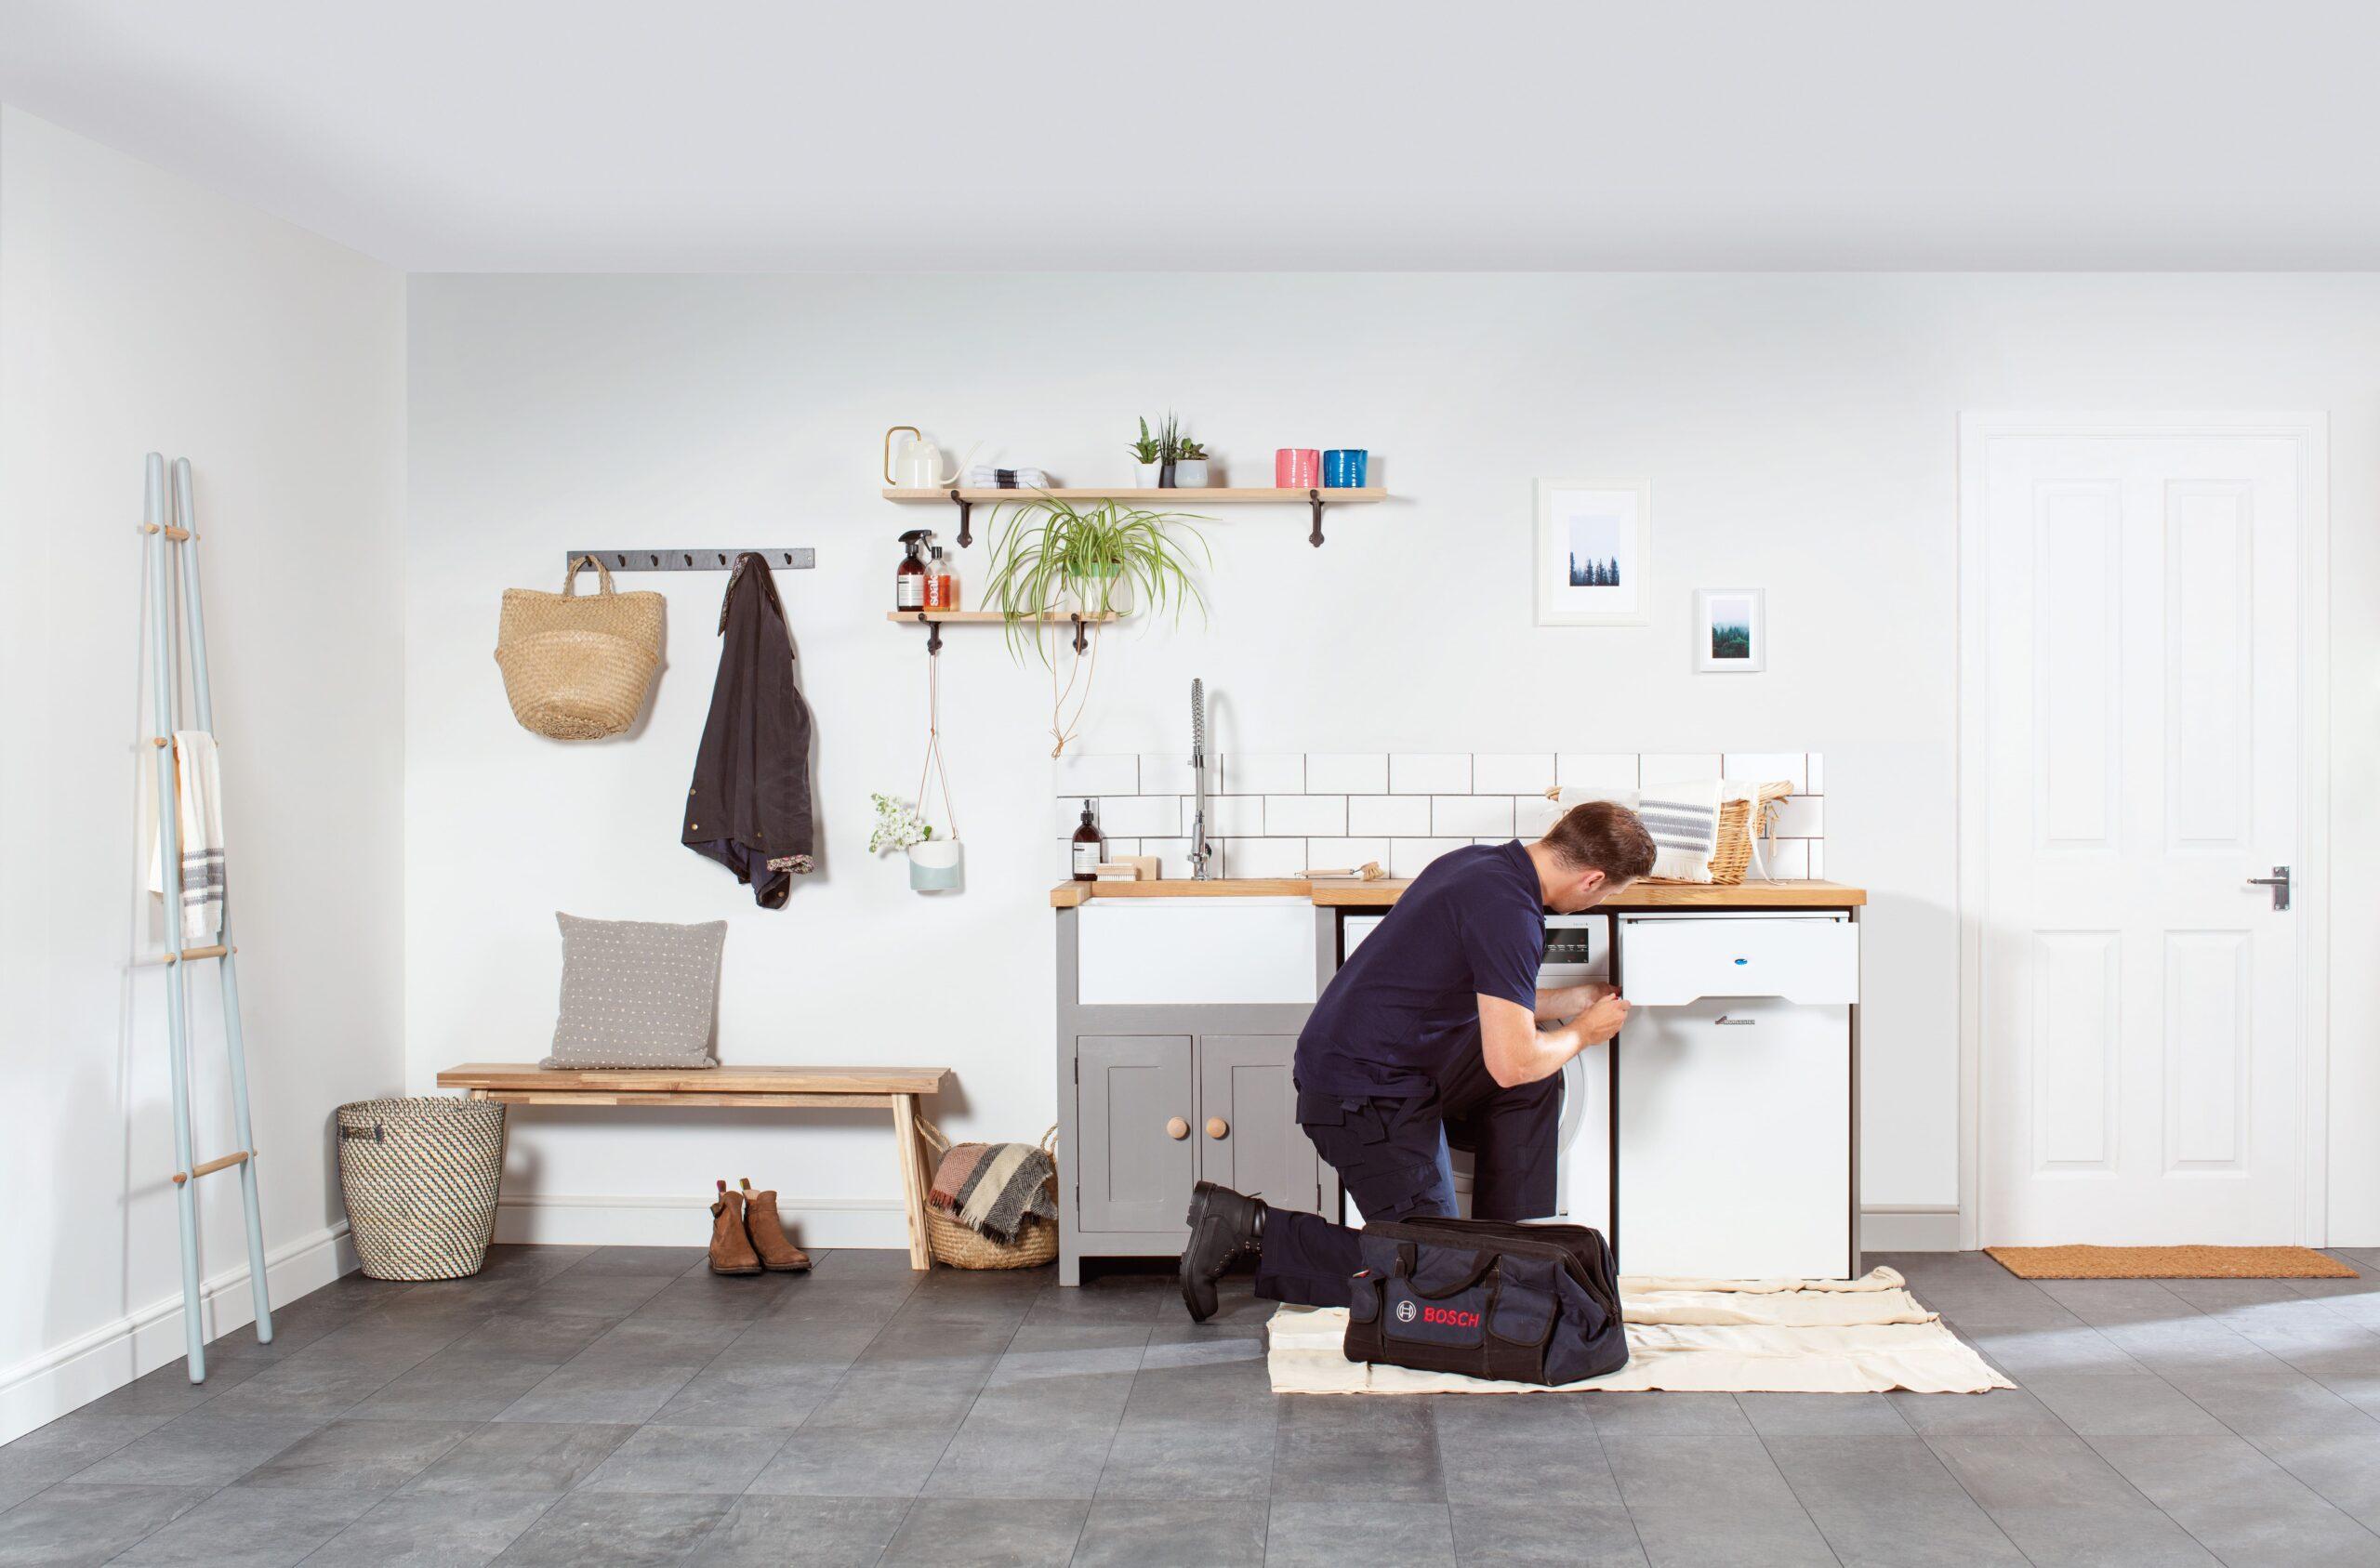 Heating Engineer in Plympton: Image of a heating engineer fitting an oil boiler.